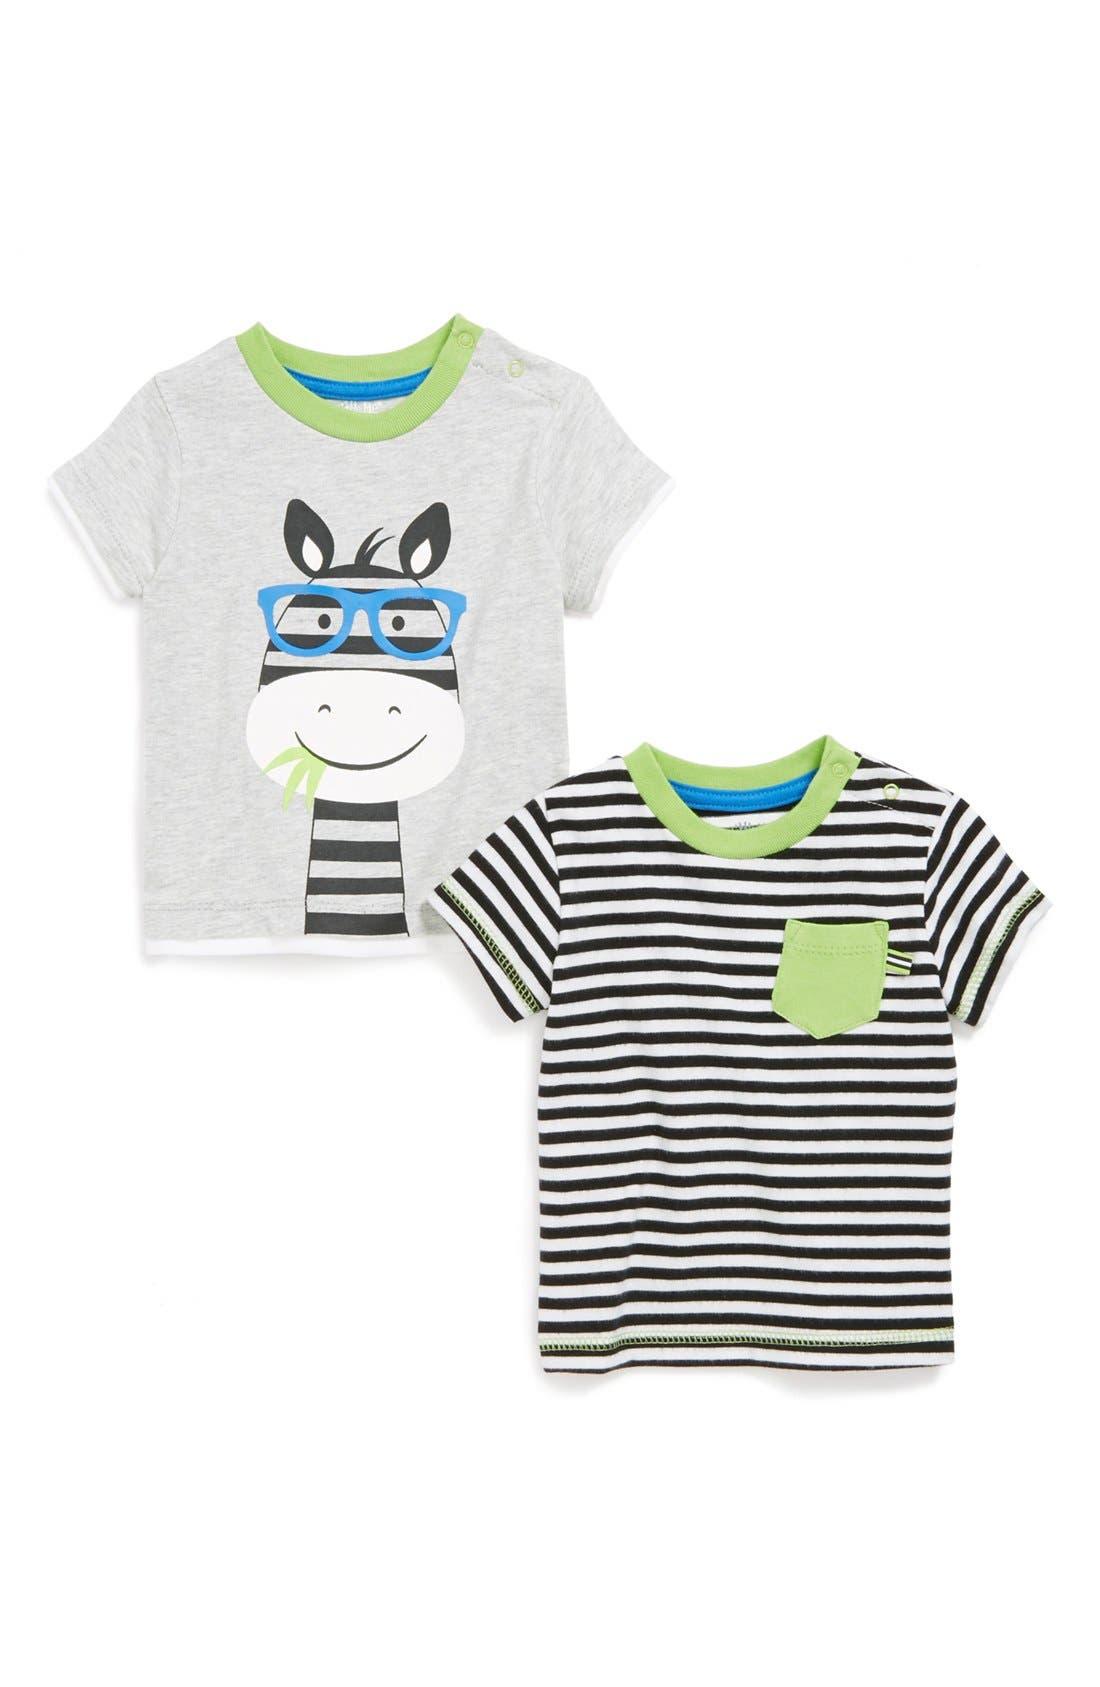 Alternate Image 1 Selected - Little Me 'Zebra' T-Shirts (2-Pack) (Baby Boys)